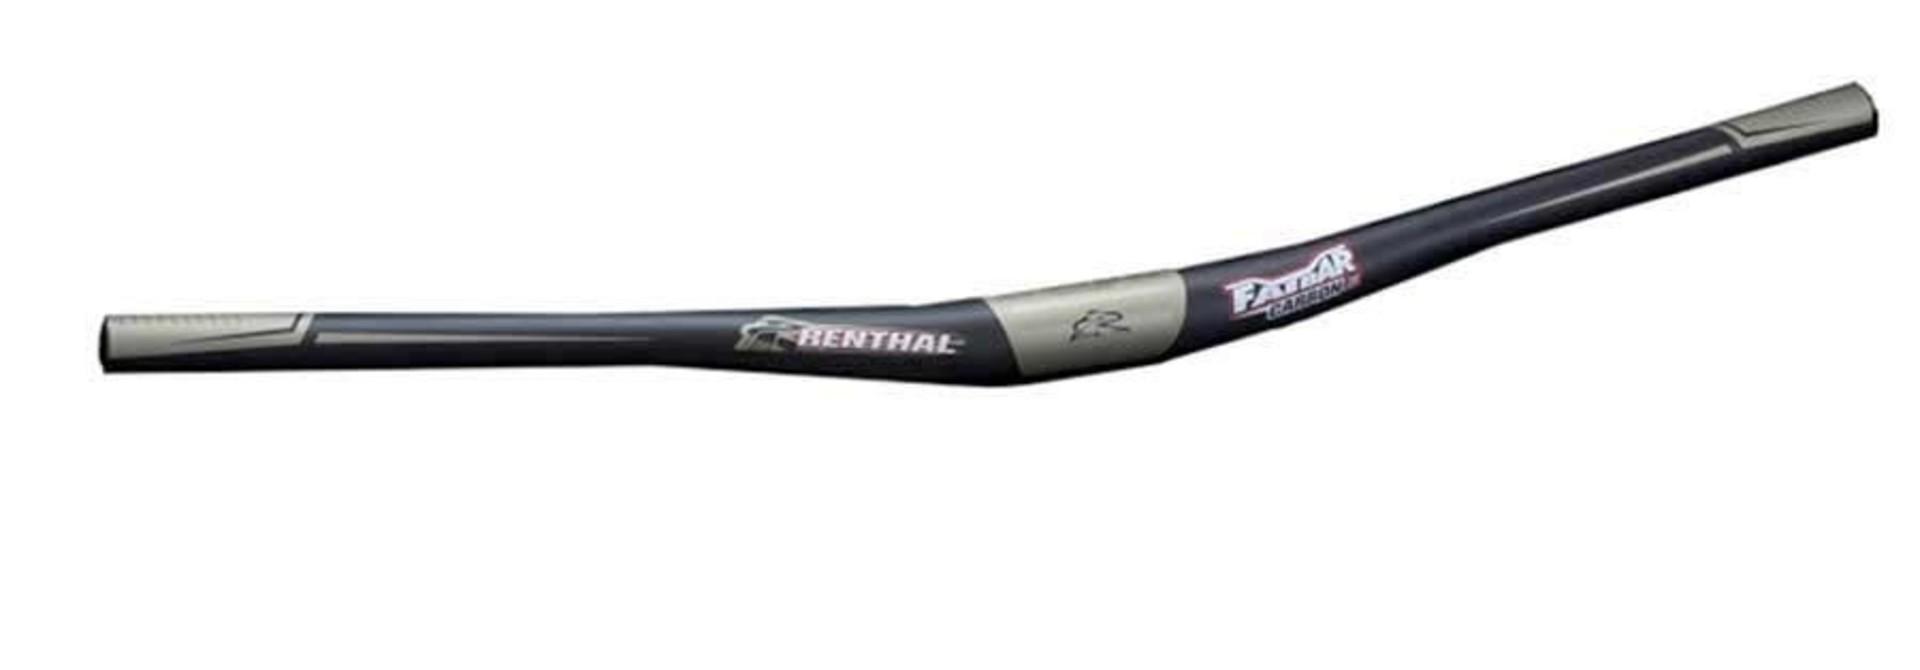 Renthal, Fatbar Carbon V2 - Black